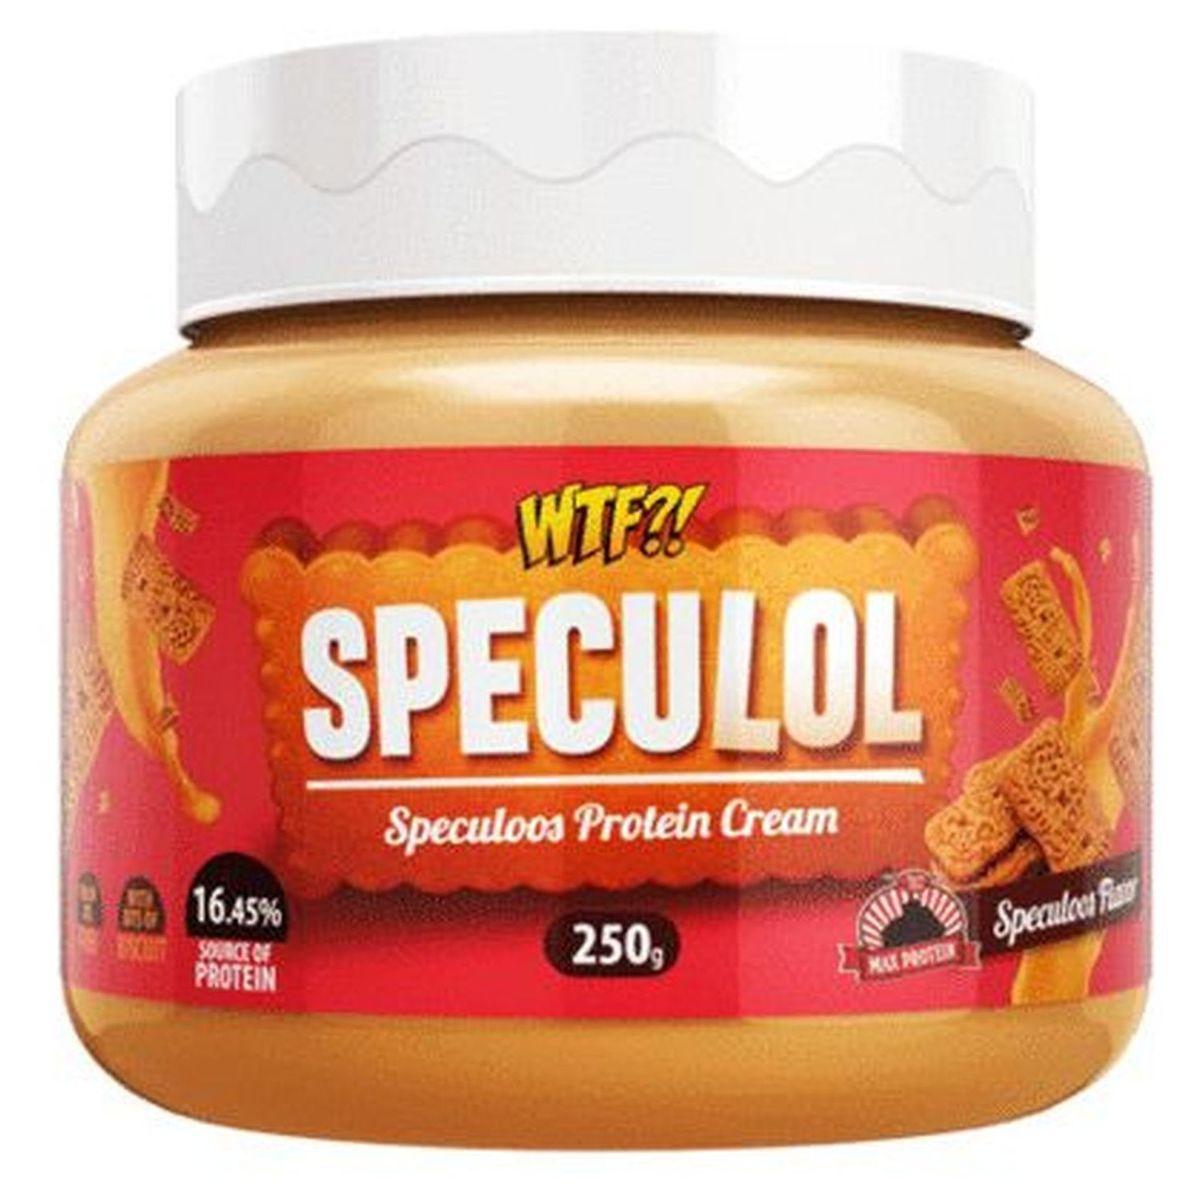 WTF - Speculol - 250g